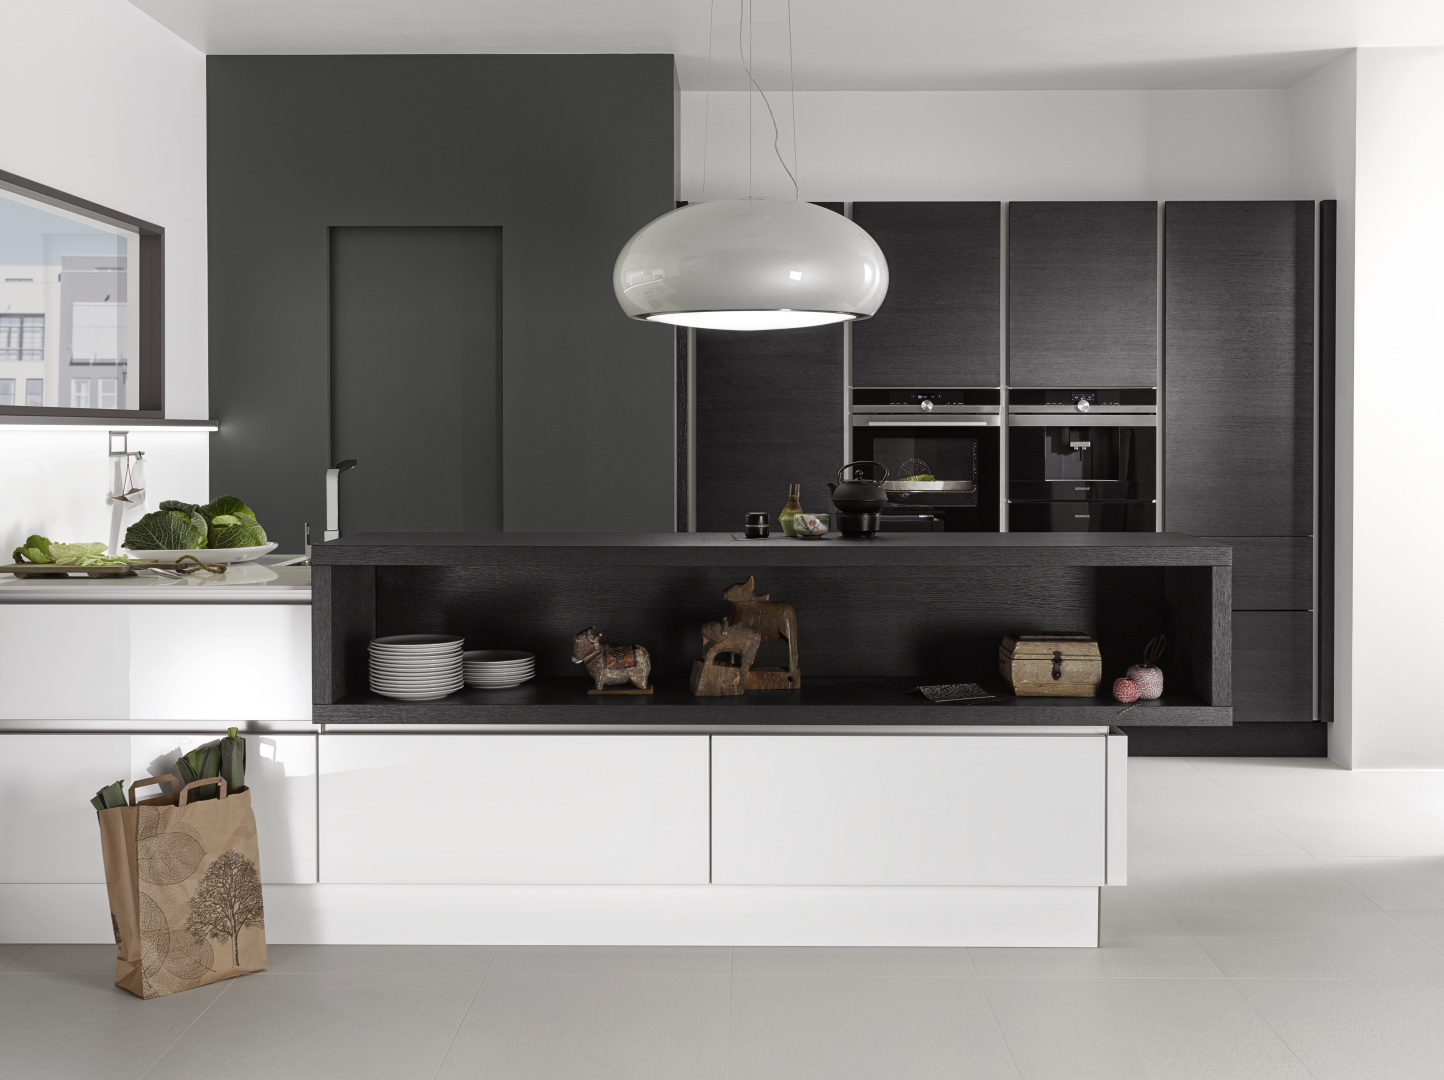 biała kuchnia ze szklanymi frontami nolte kuchen glas tec plus szafy fornirowane